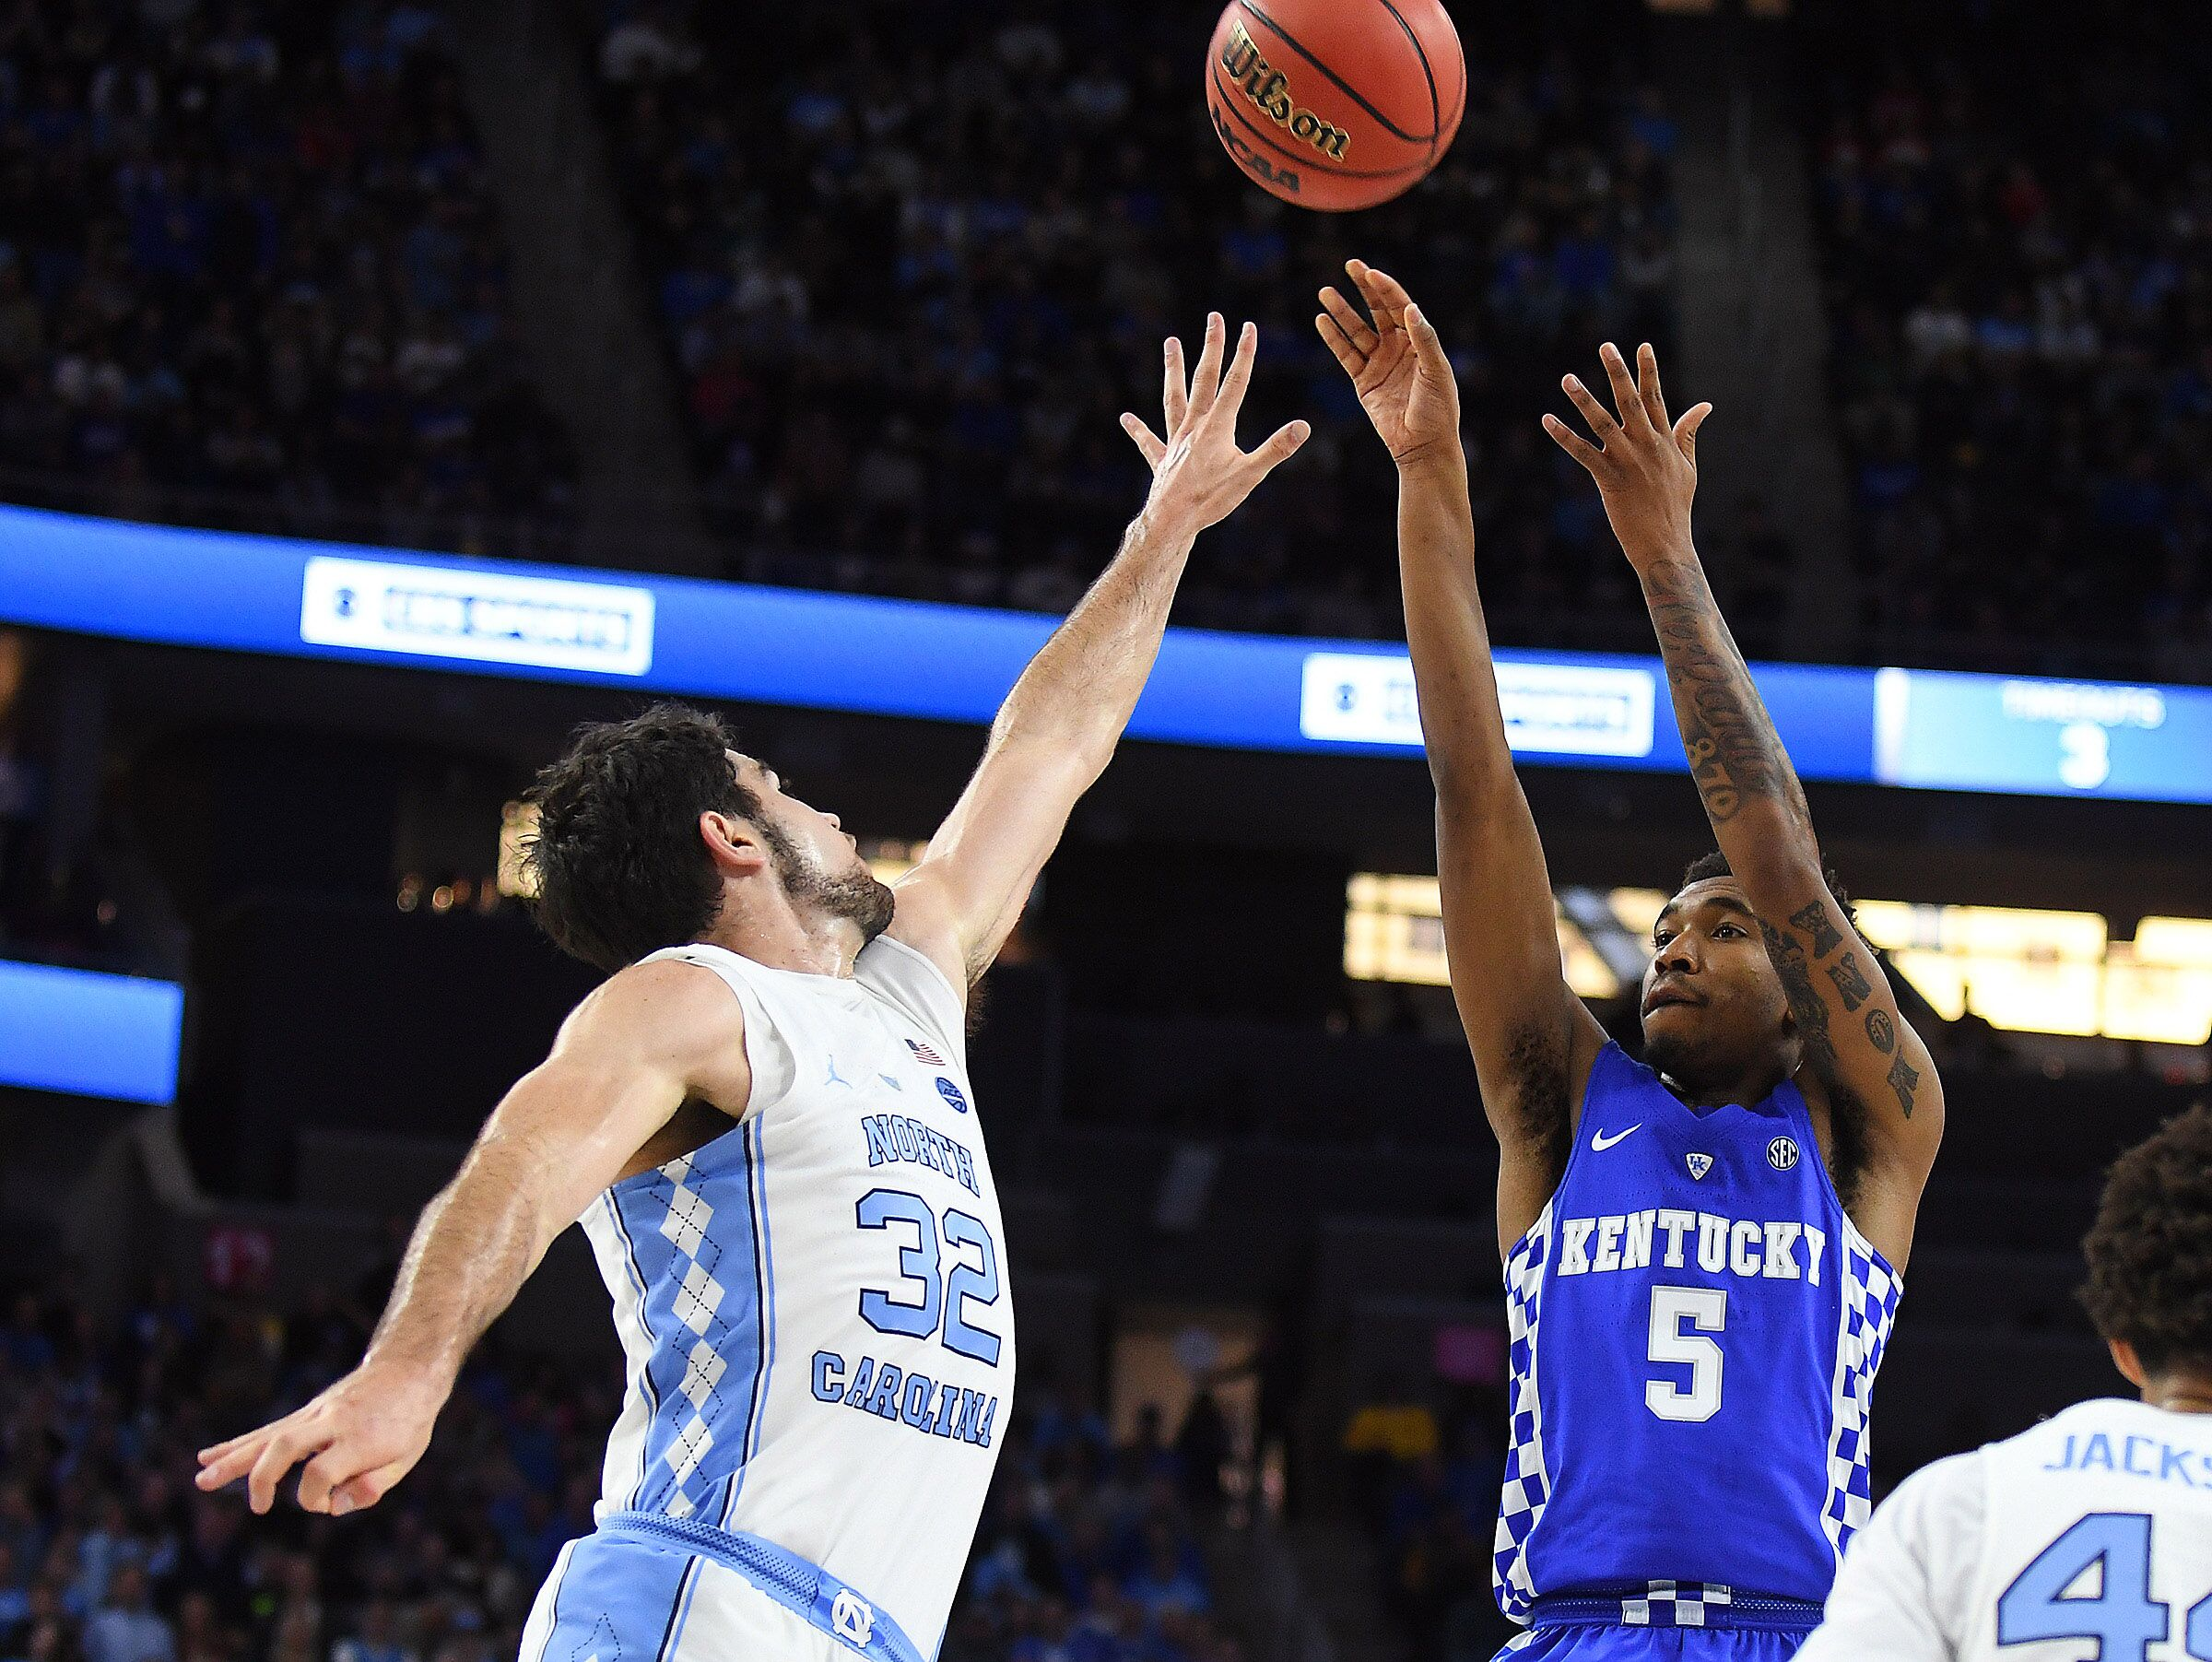 Uk Basketball: Kentucky Basketball: Strong North Carolina Scoring Calls